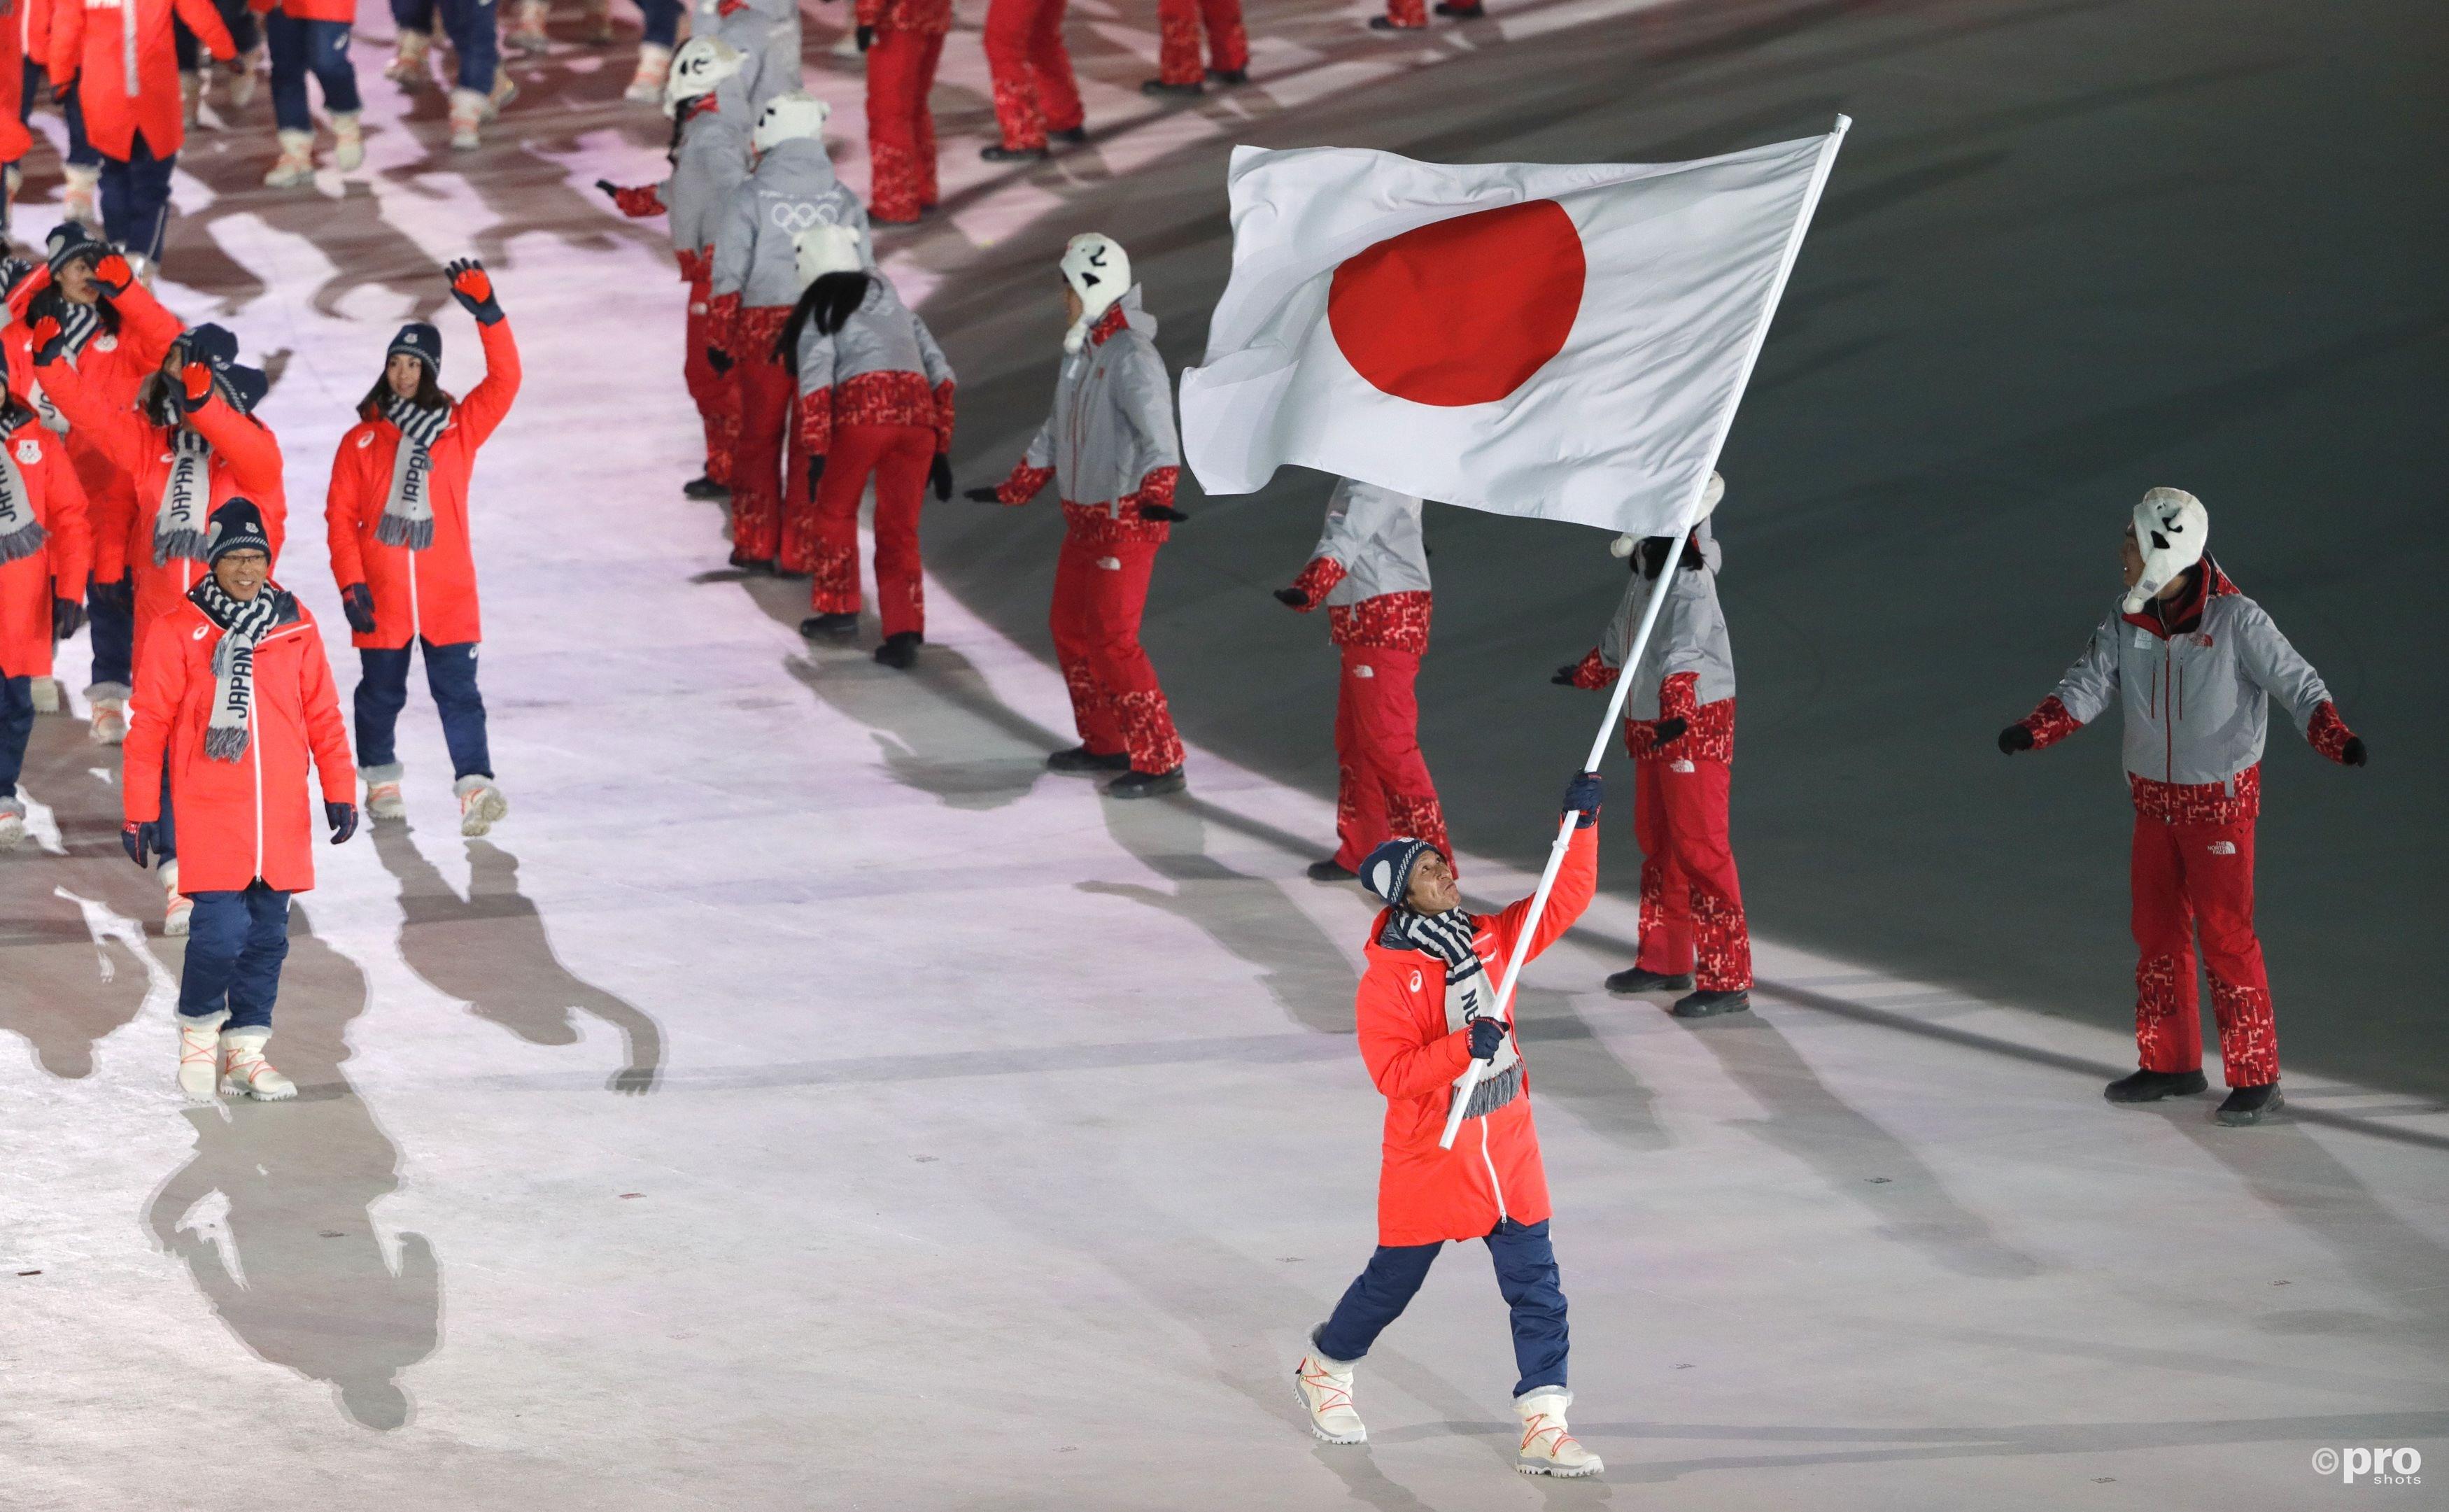 Kasai als trotse vlaggendrager tijdens de openingsceremonie in Pyeongchang (Pro Shots/Action Images)